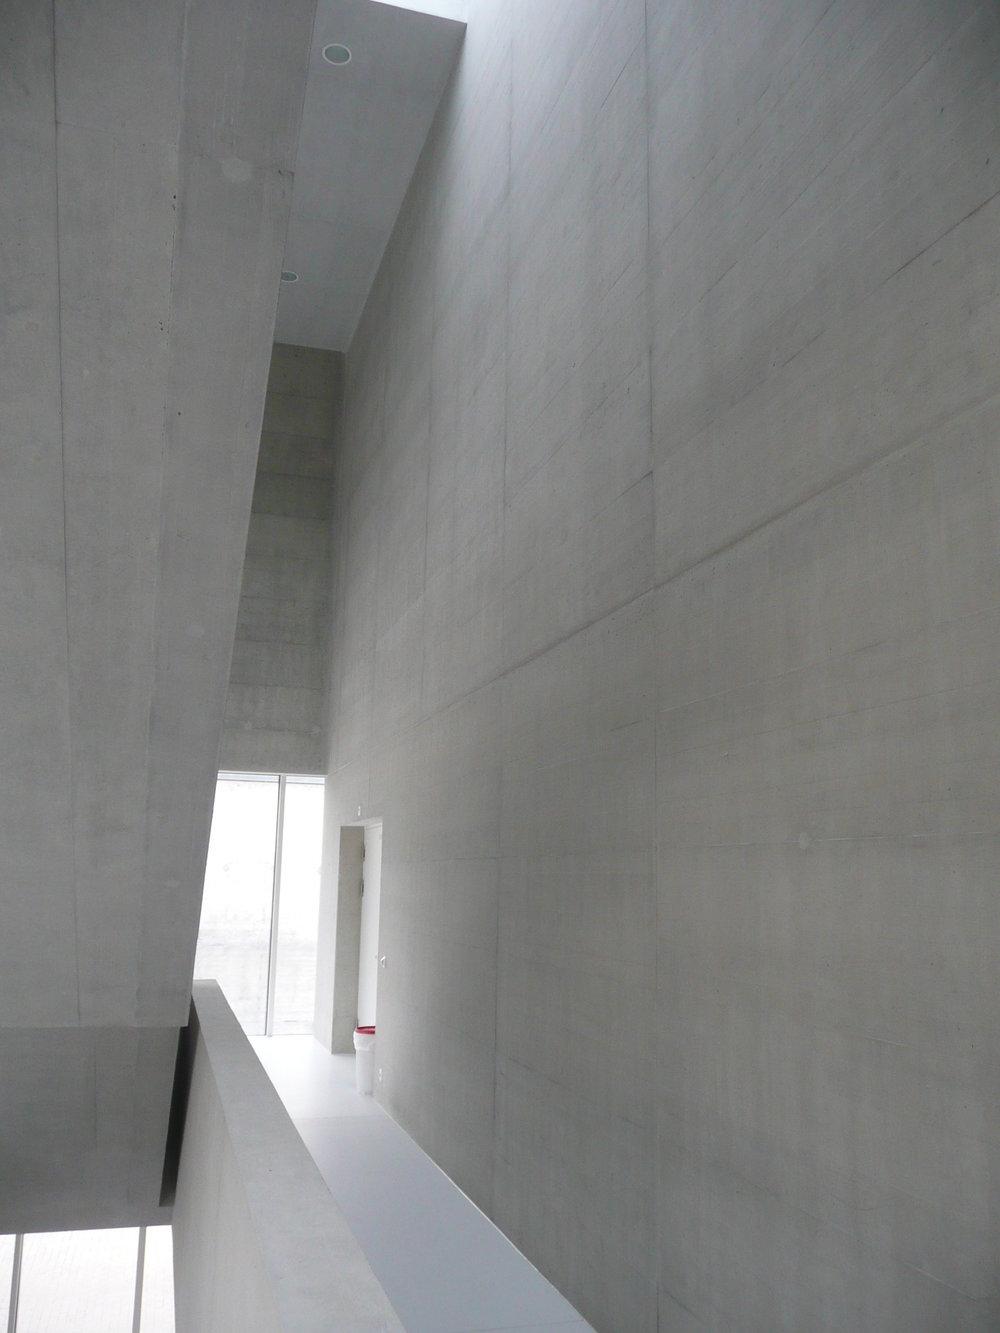 BEECK Concrete Stone Glaze Project - Gym in Liestal Switzerland 1